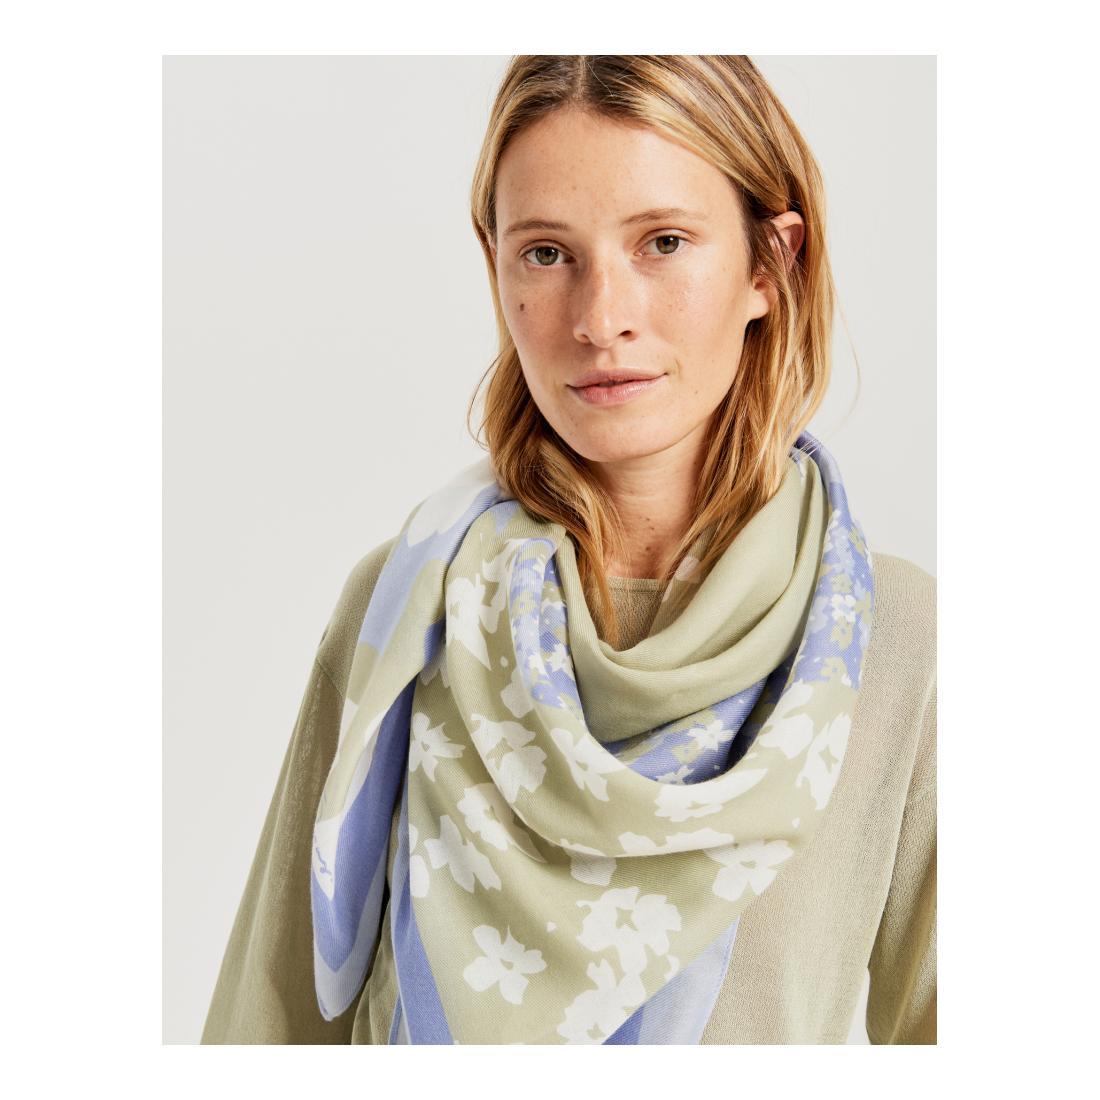 Opus Schal Asophie scarf